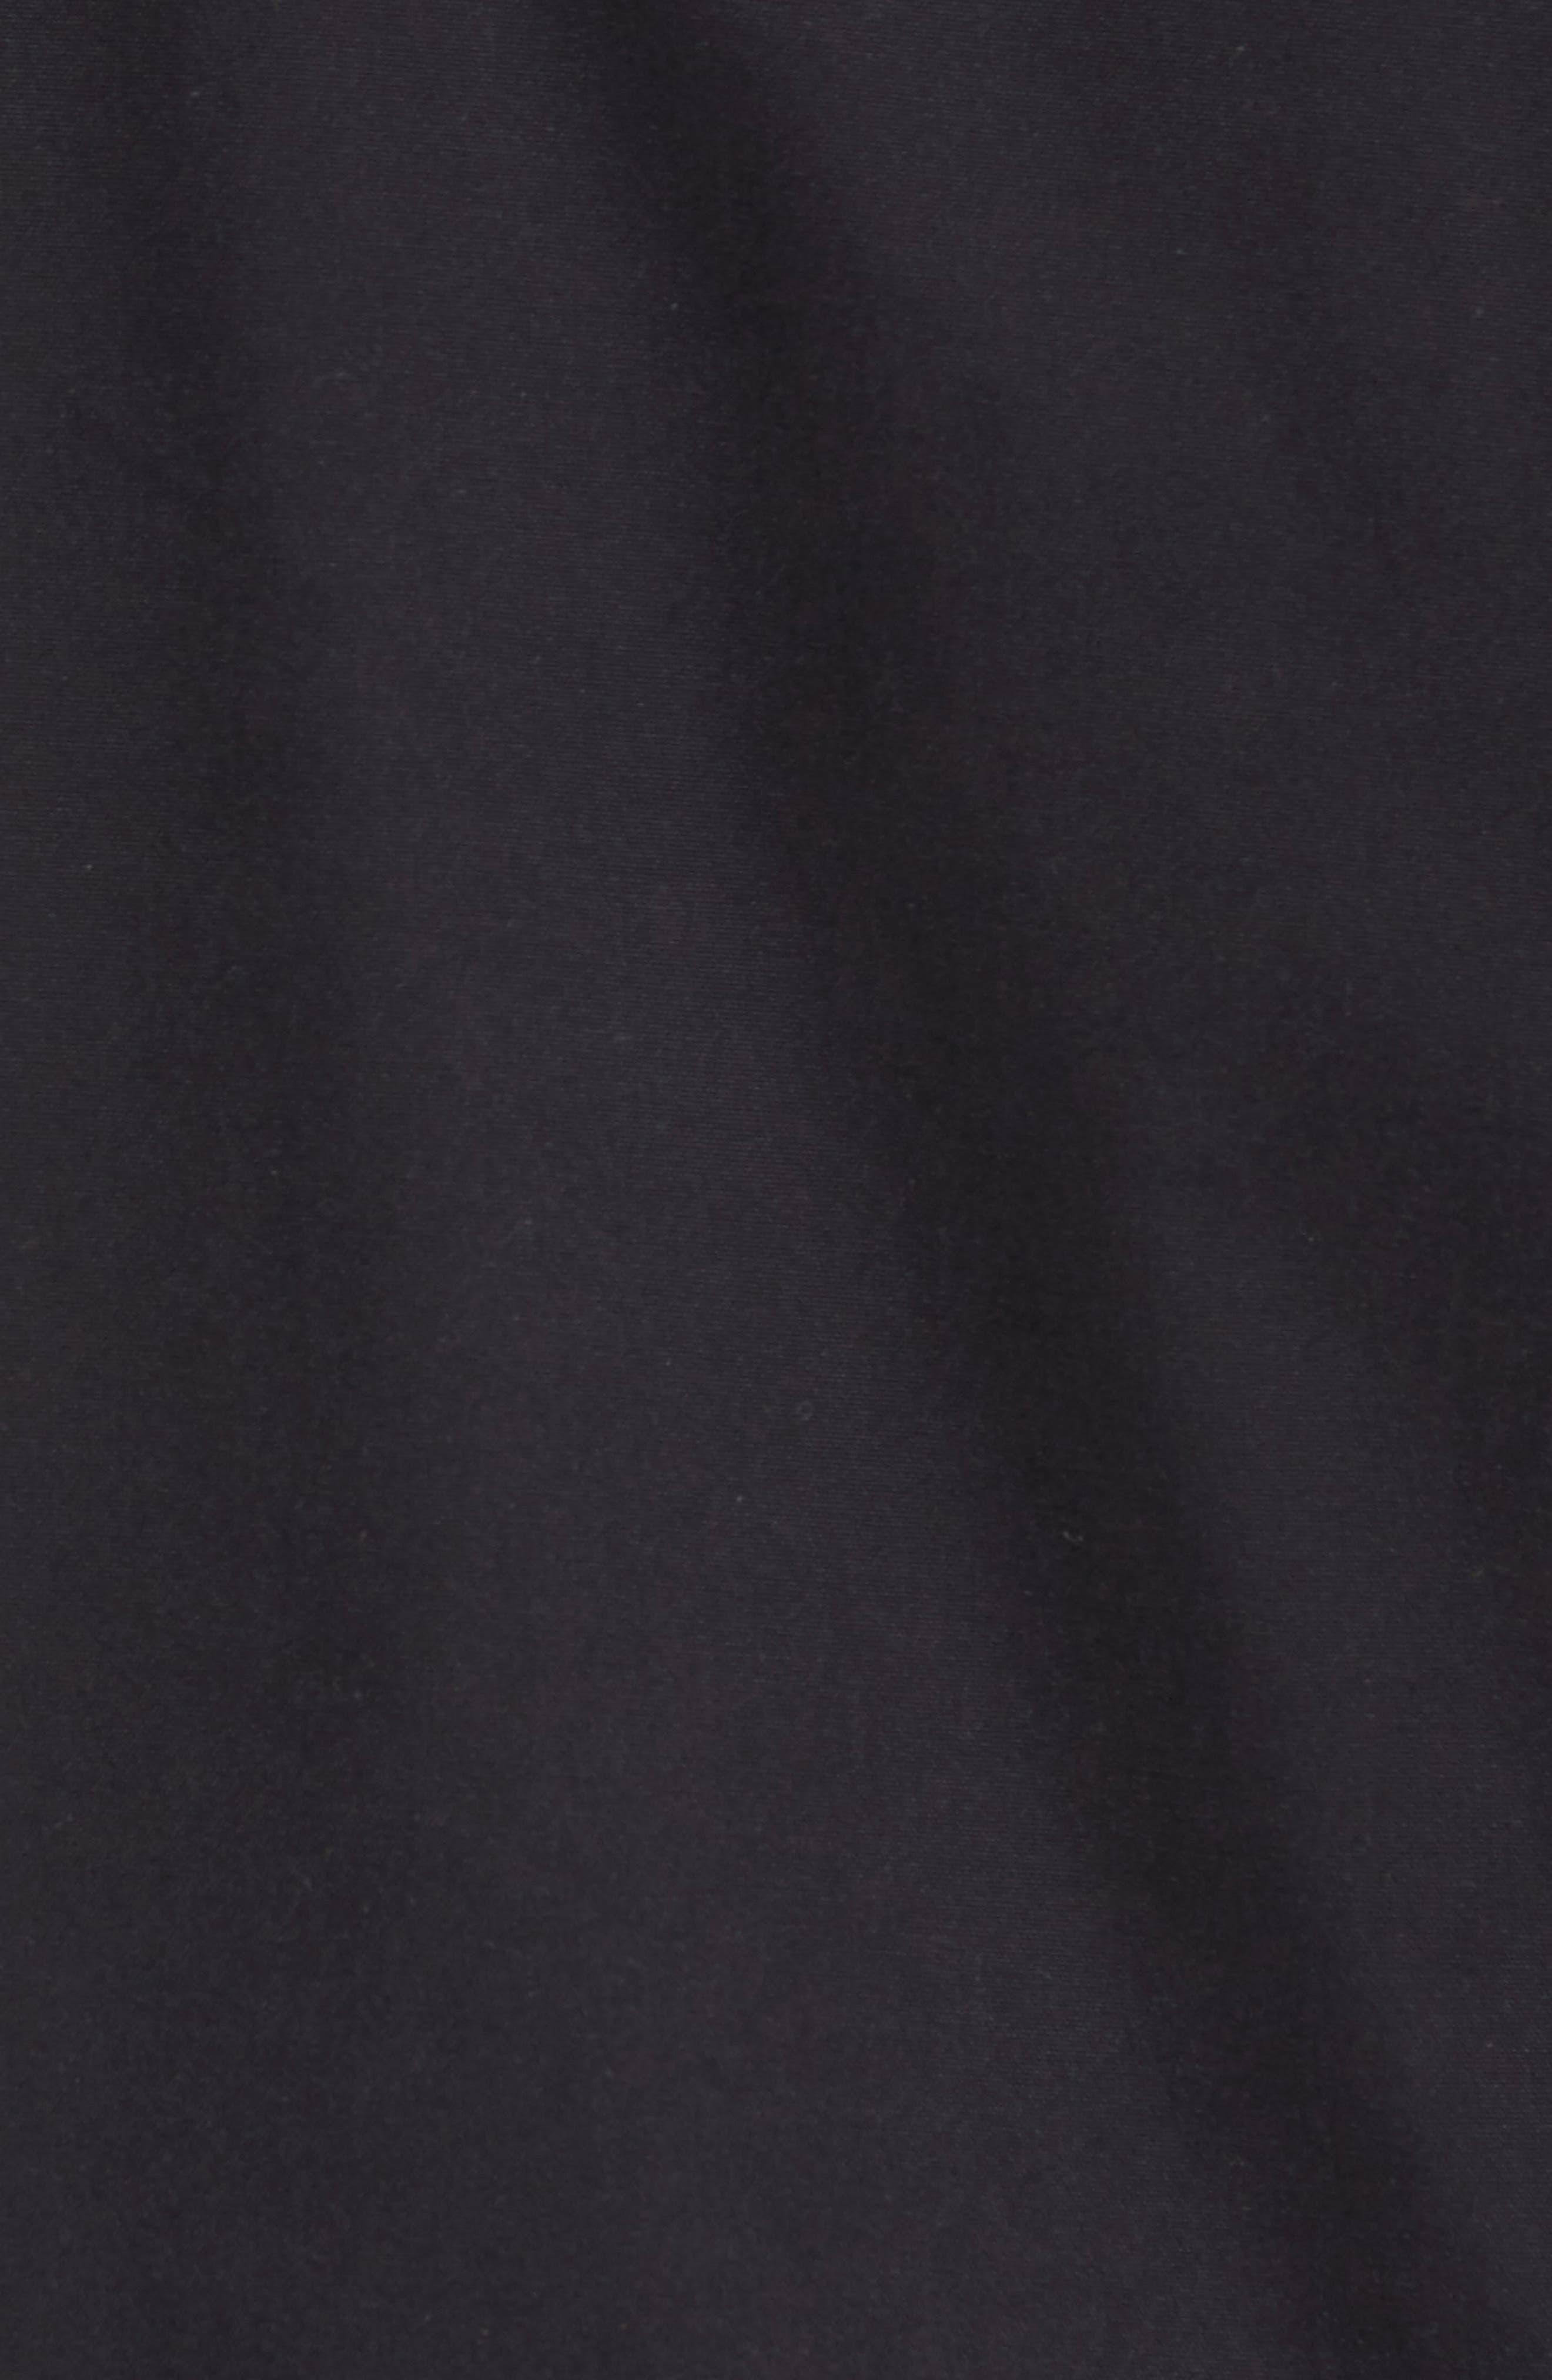 Hooded Bomber Jacket,                             Alternate thumbnail 5, color,                             Black